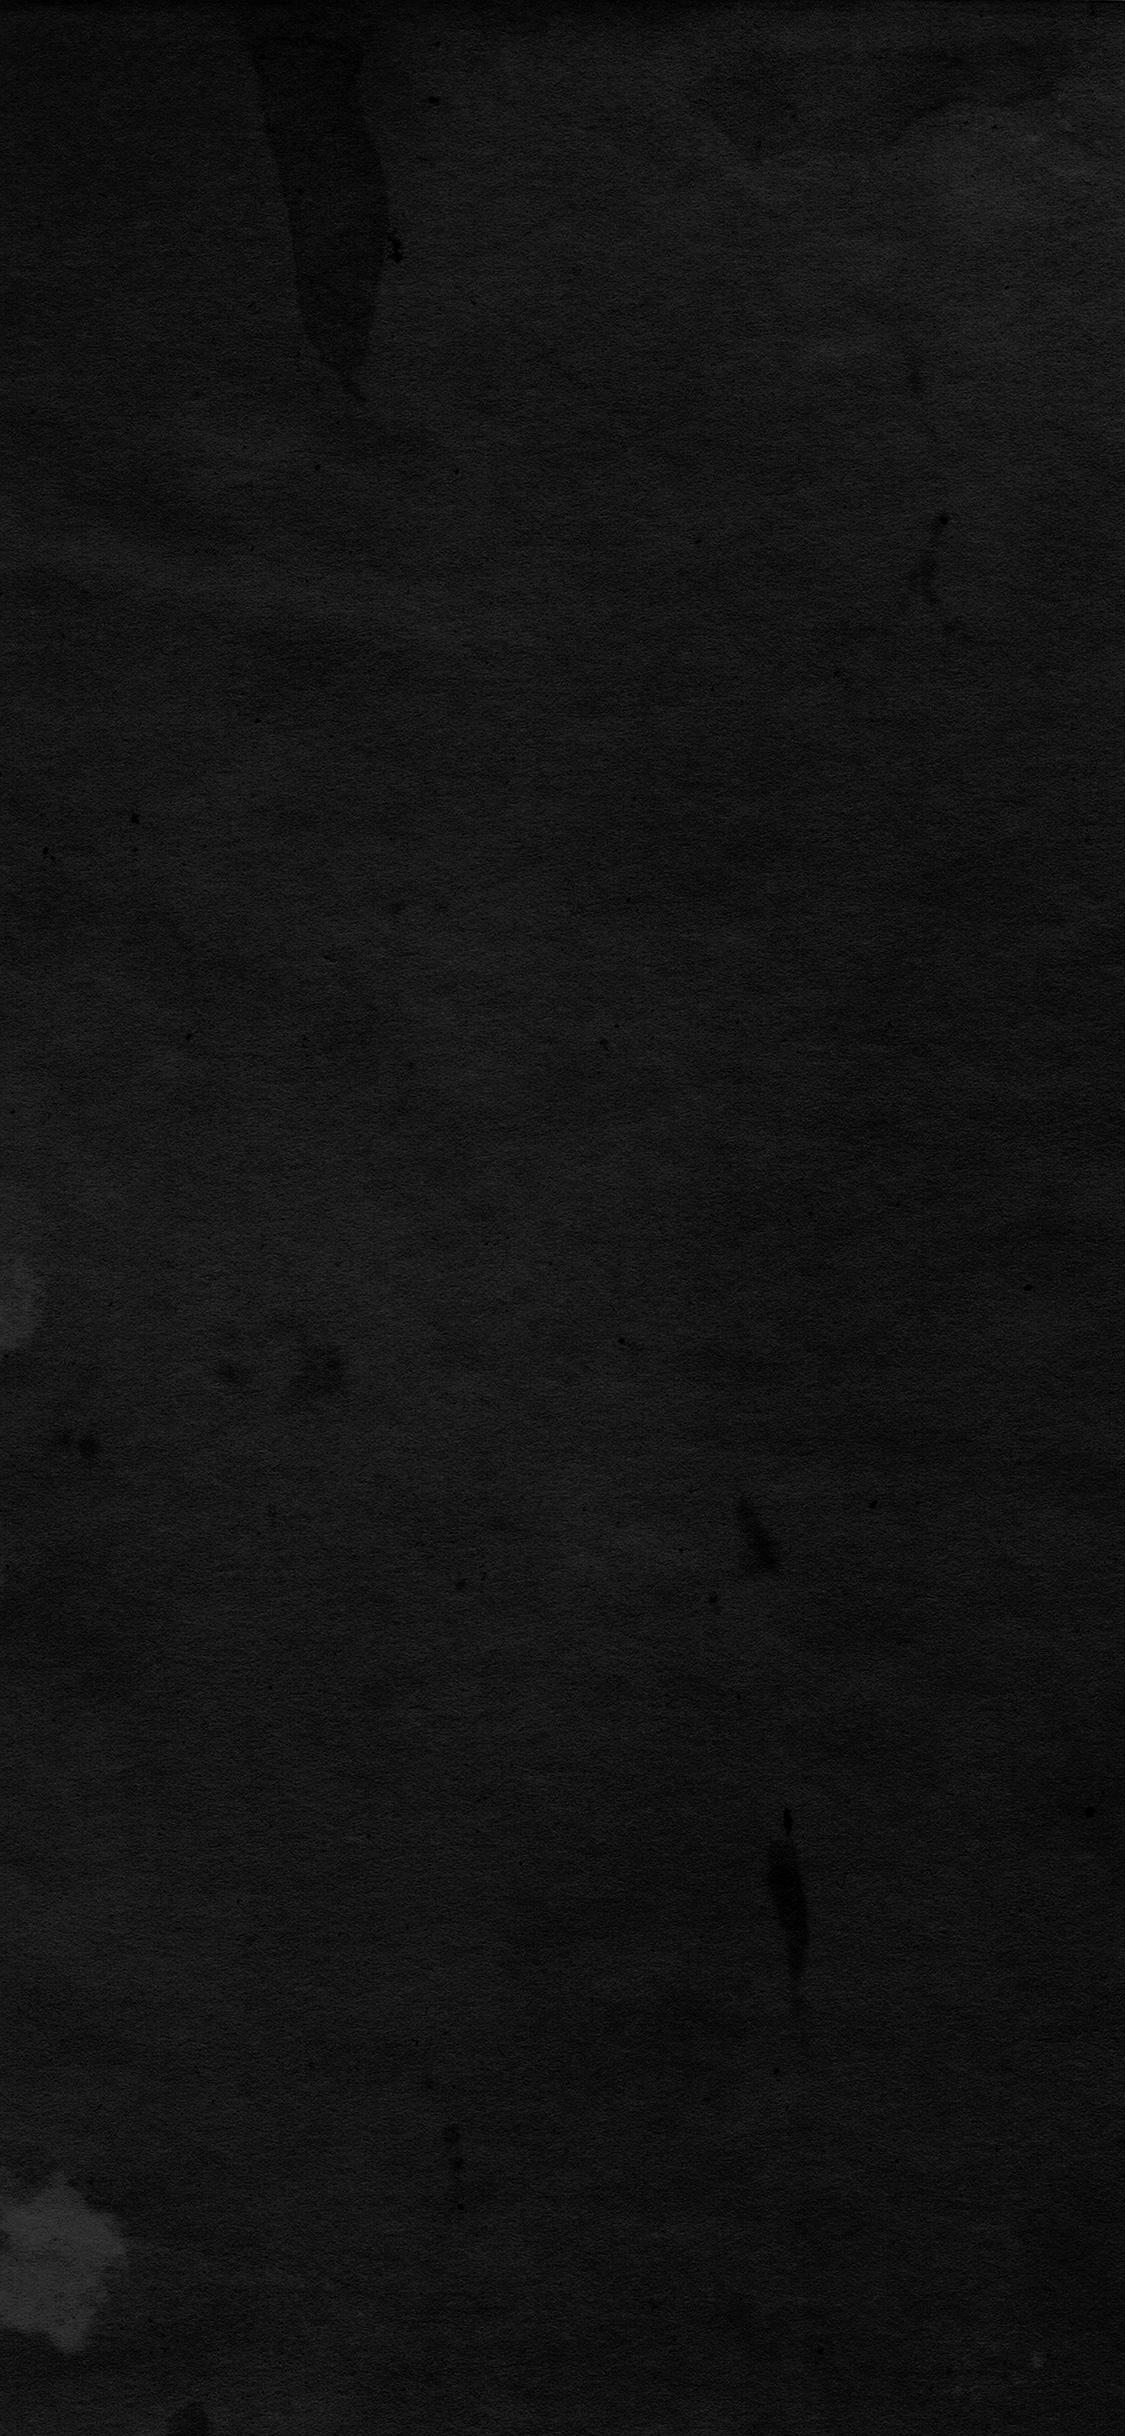 Watercolor Texture Dark Black Pattern Iphone X Wallpapers